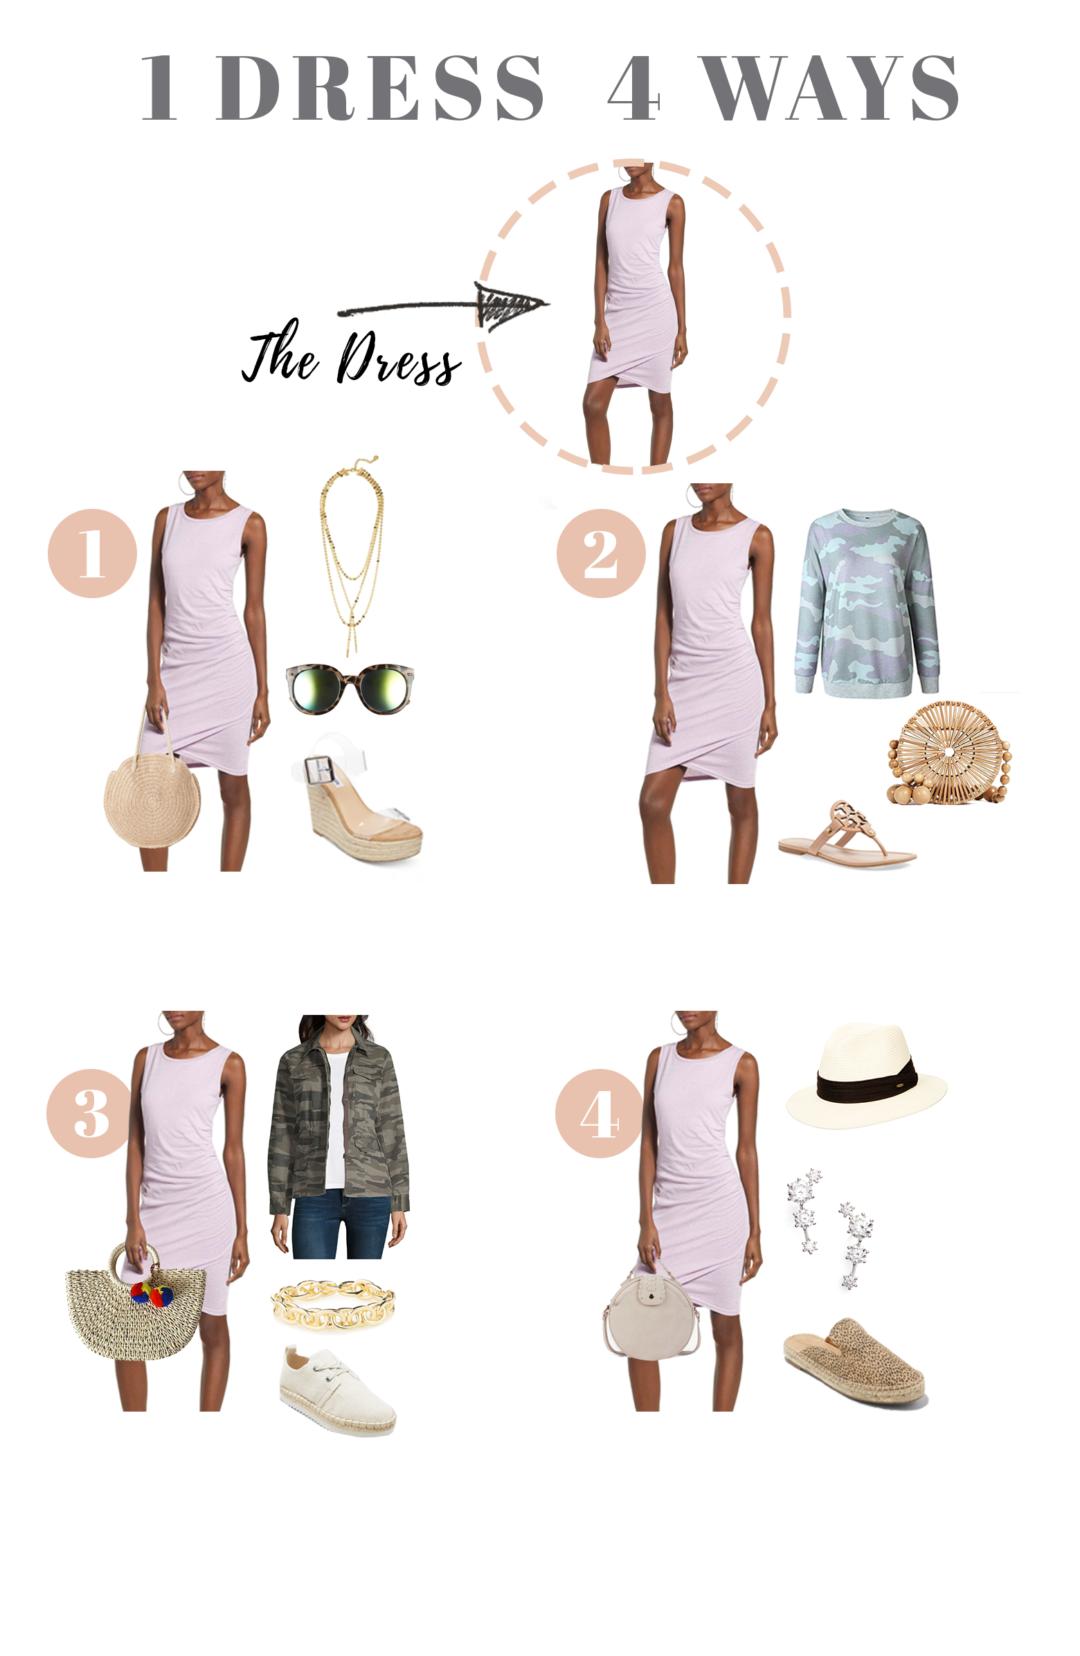 casual spring dress 4 ways - pinteresting plans blog